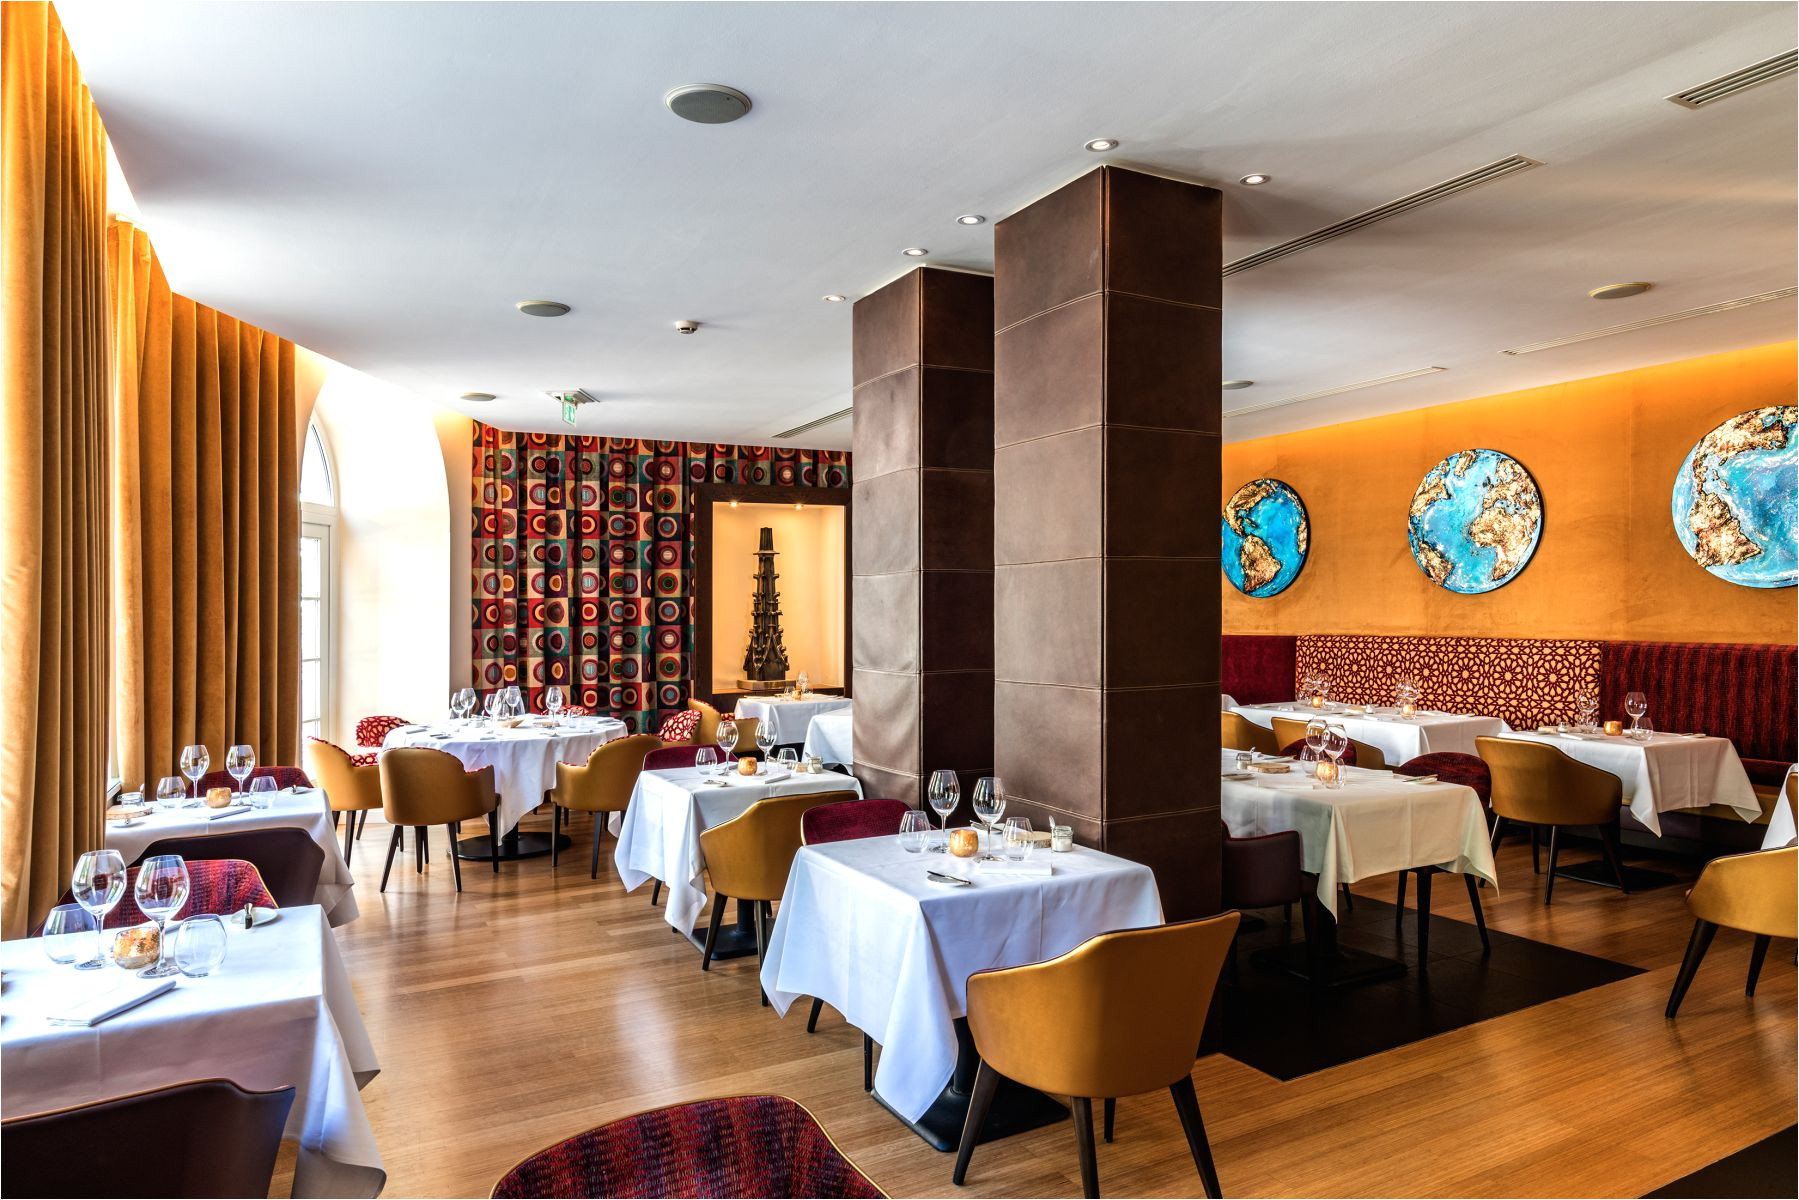 Coupon Code for Restaurant Furniture 4 Less Restaurant Bar Le Pont tournant Hotel Straa Burg Regent Petite